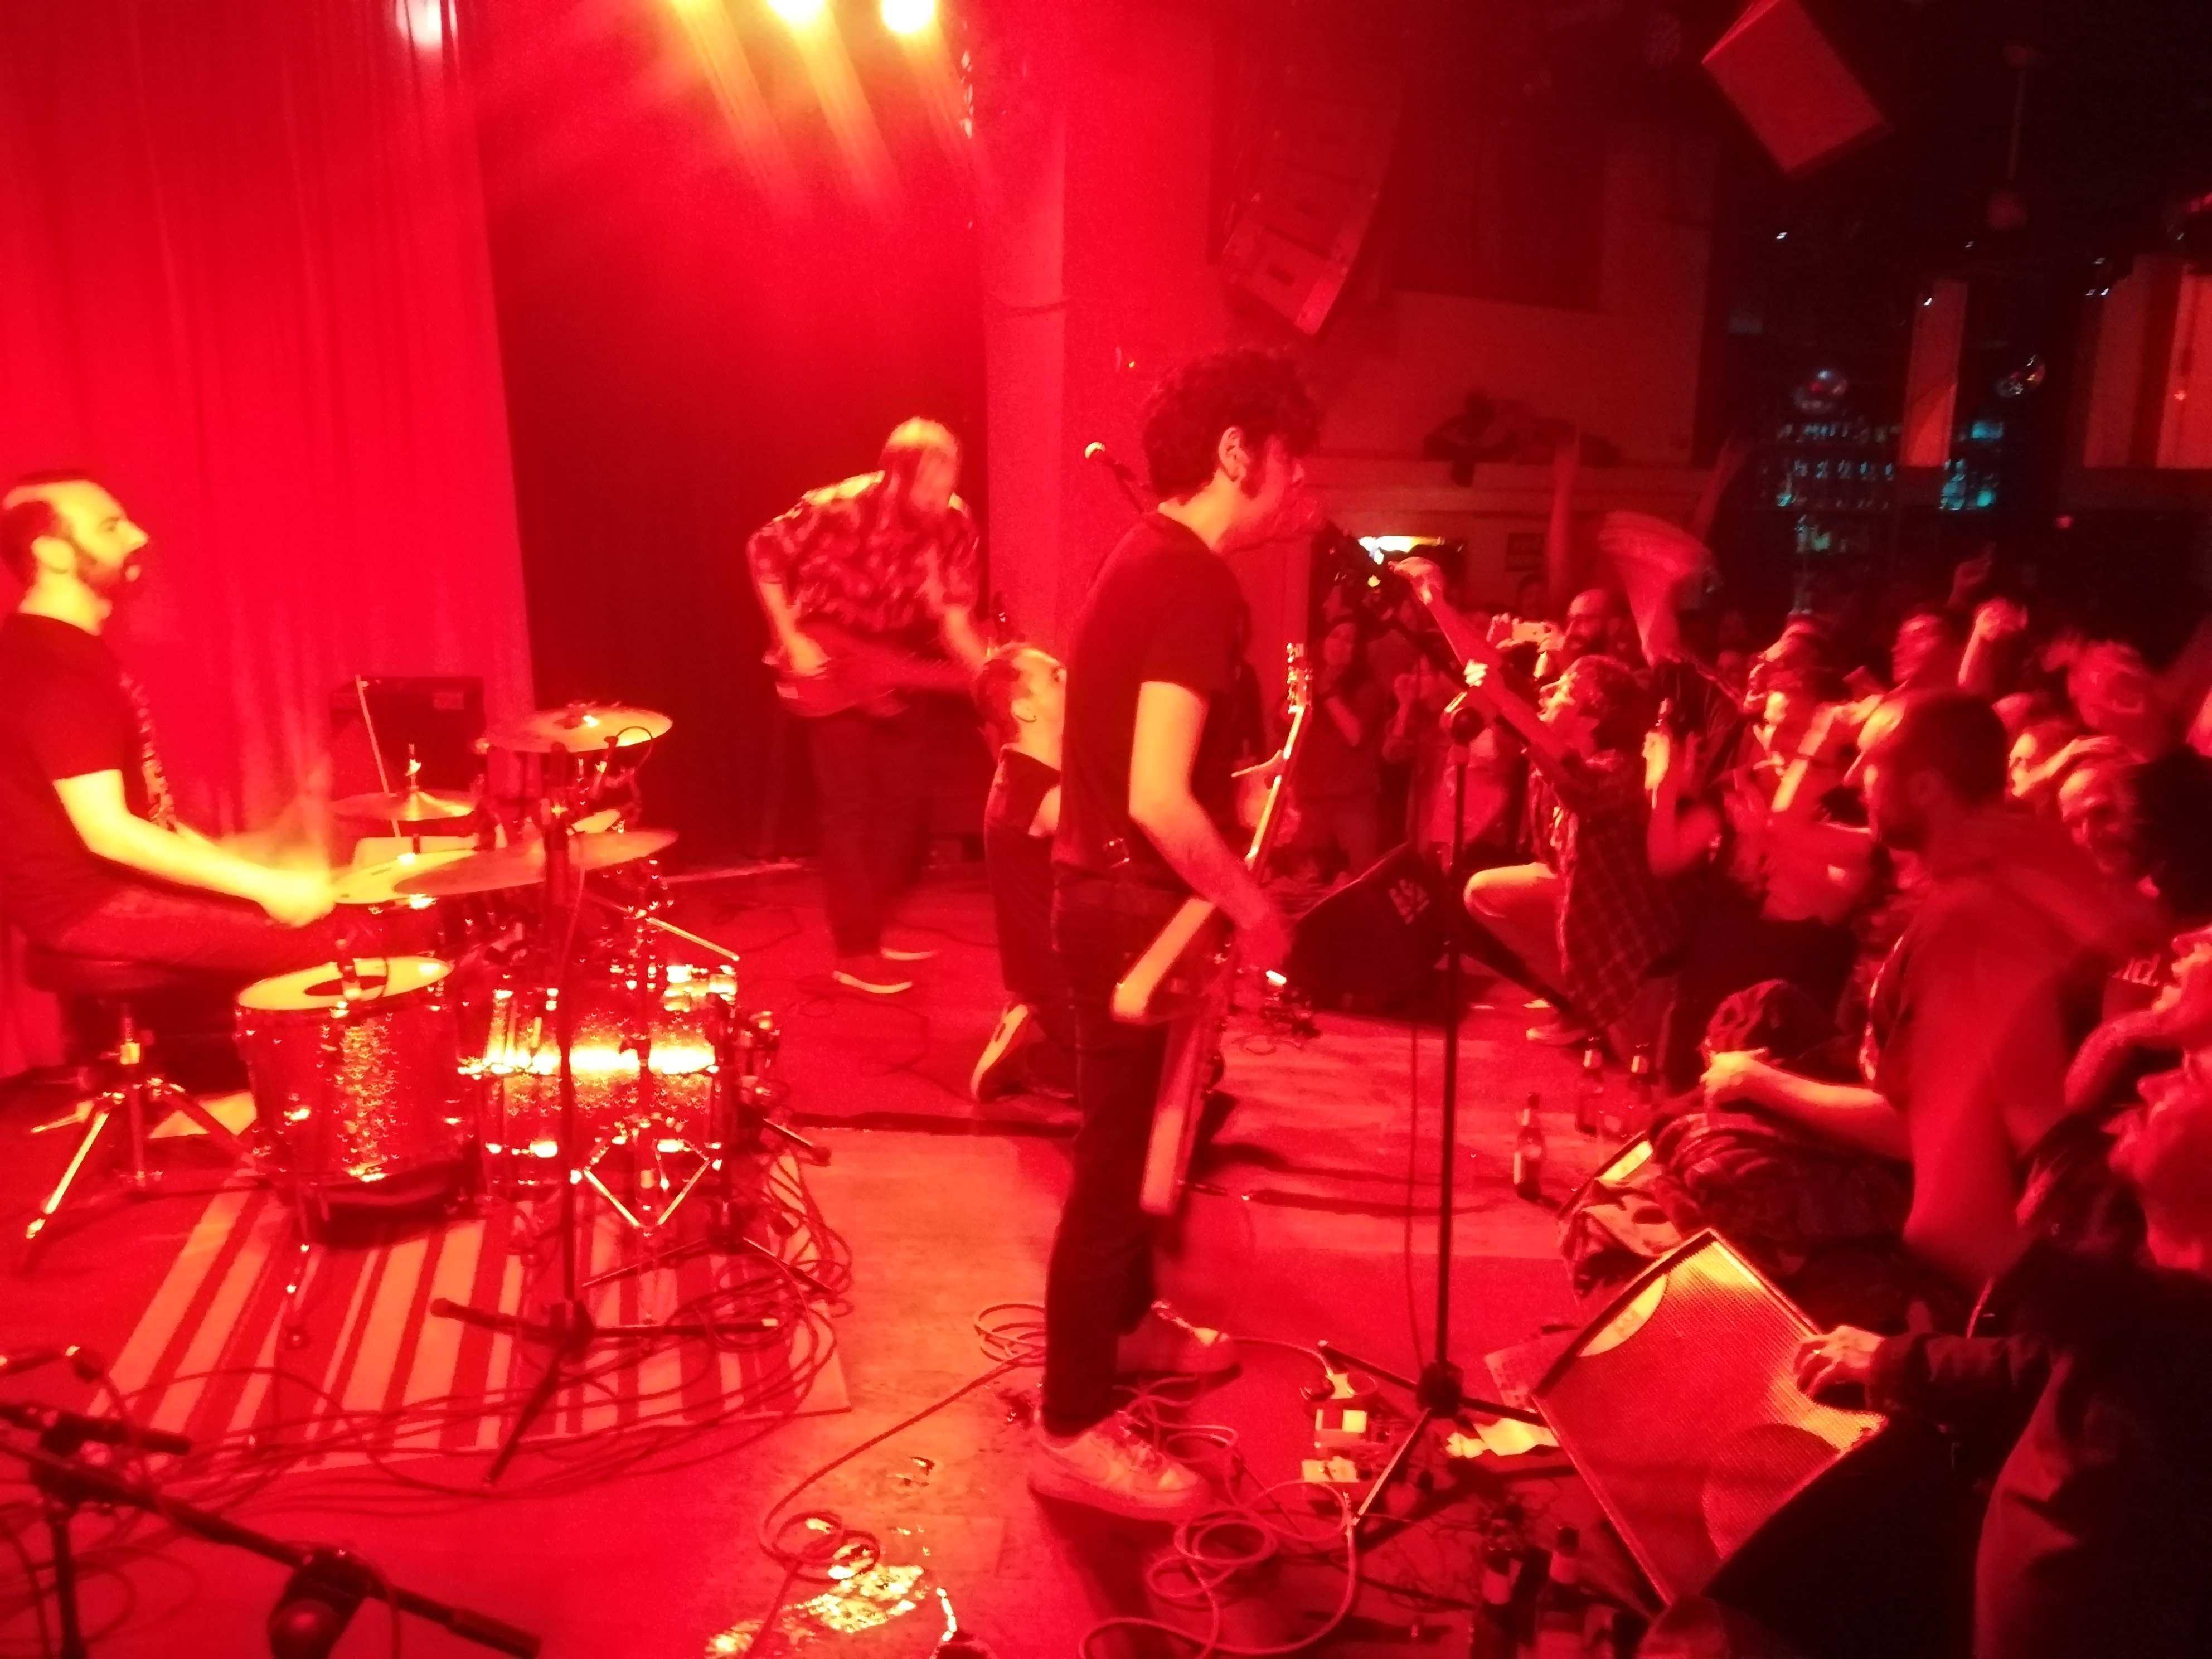 Banda barcelonesa de heavy pop